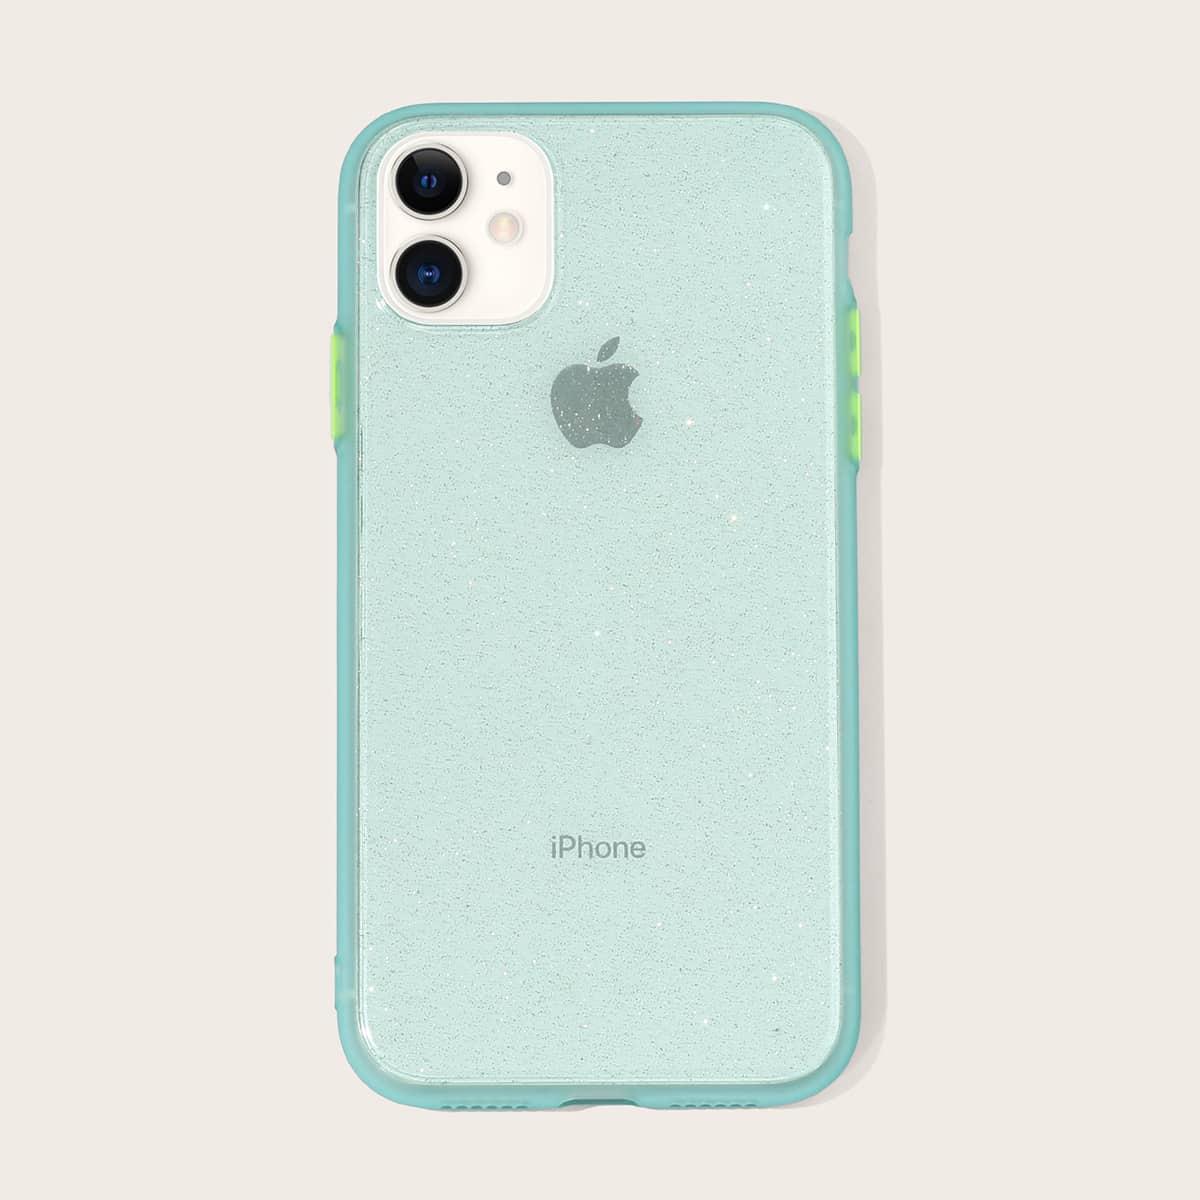 Блестящий прозрачный чехол для iPhone фото